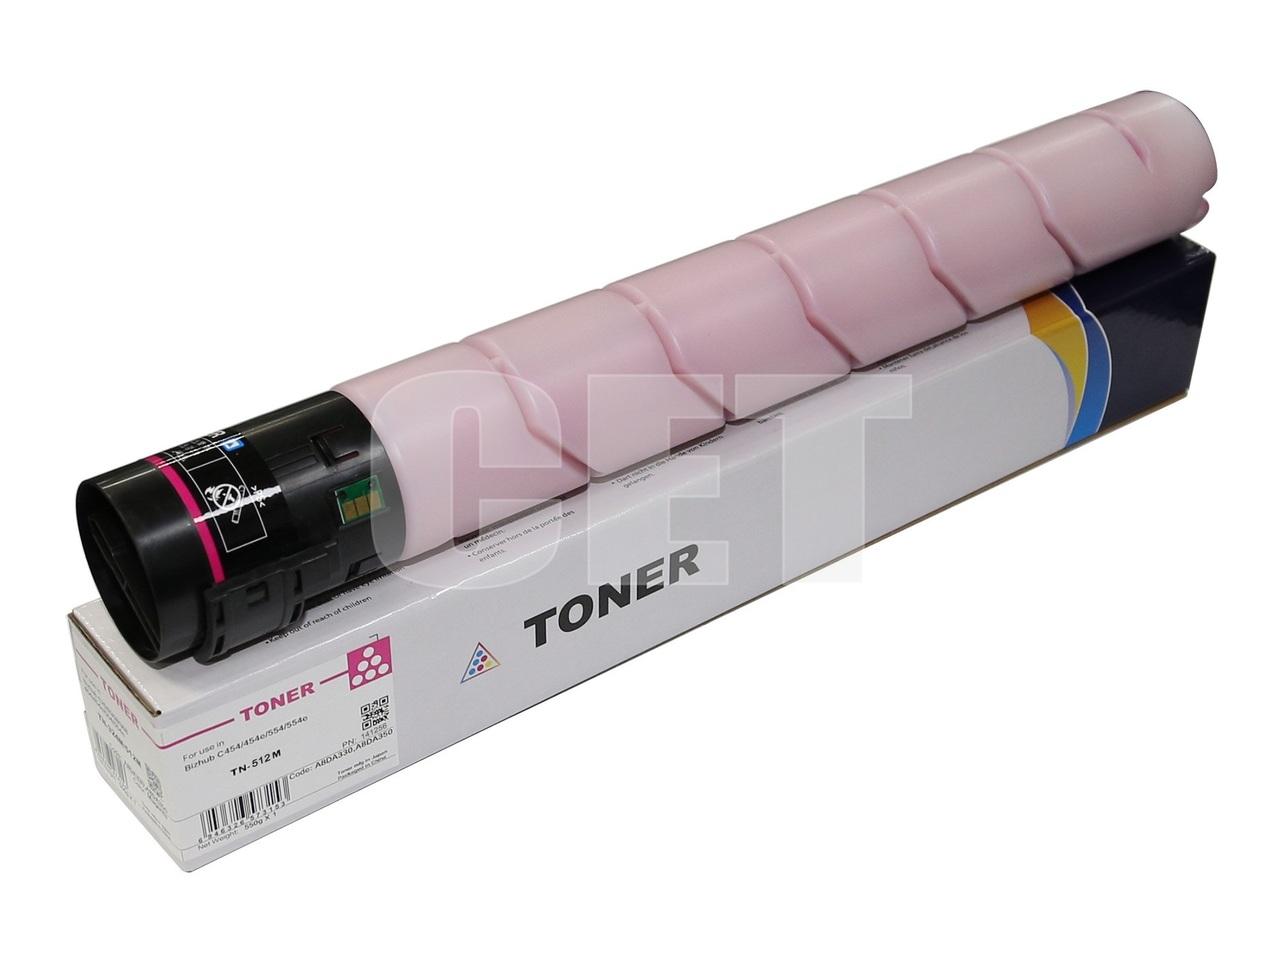 Тонер-картридж (CPT) TN-512M для KONICA MINOLTA BizhubC454/554/454e/554e (CET) Magenta, 514г, 26000 стр.,CET141256